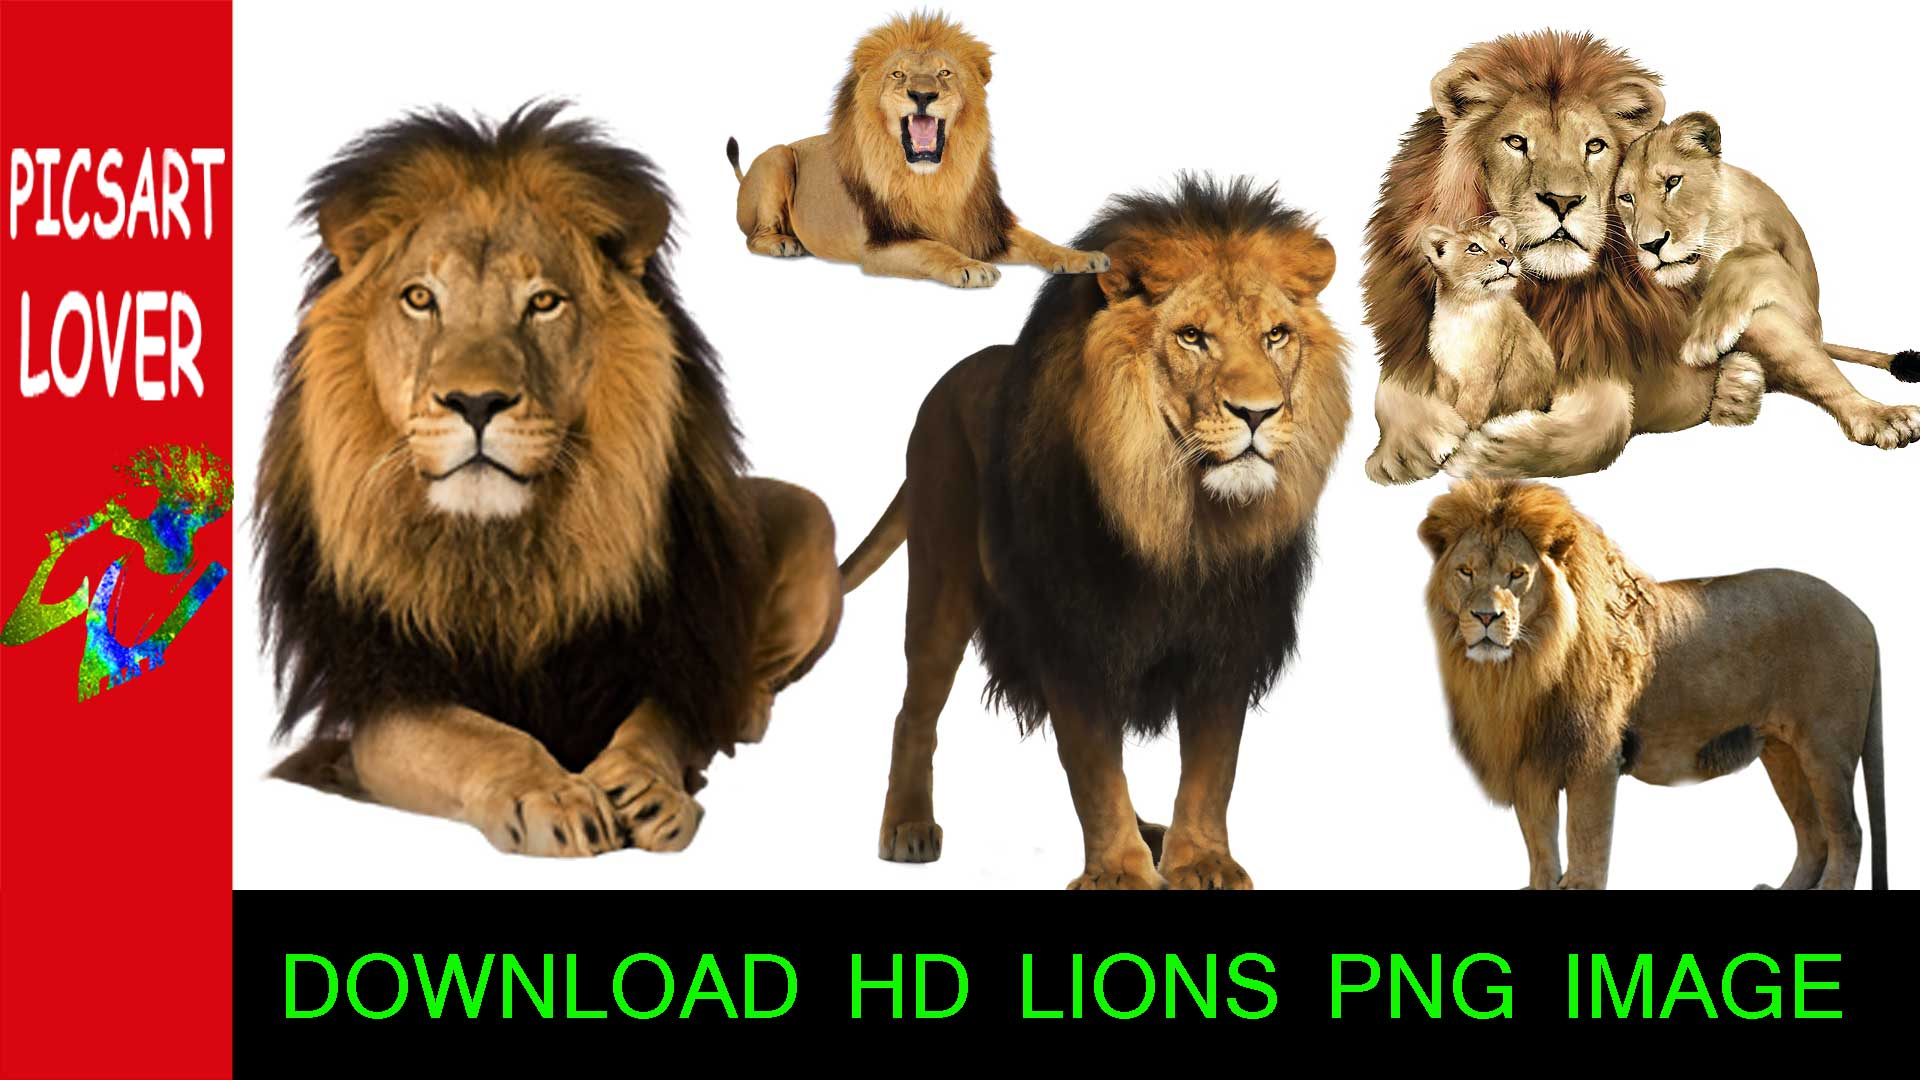 LION PNG LION IMAGES FREE LION IMAGES - Free Lion PNG HD